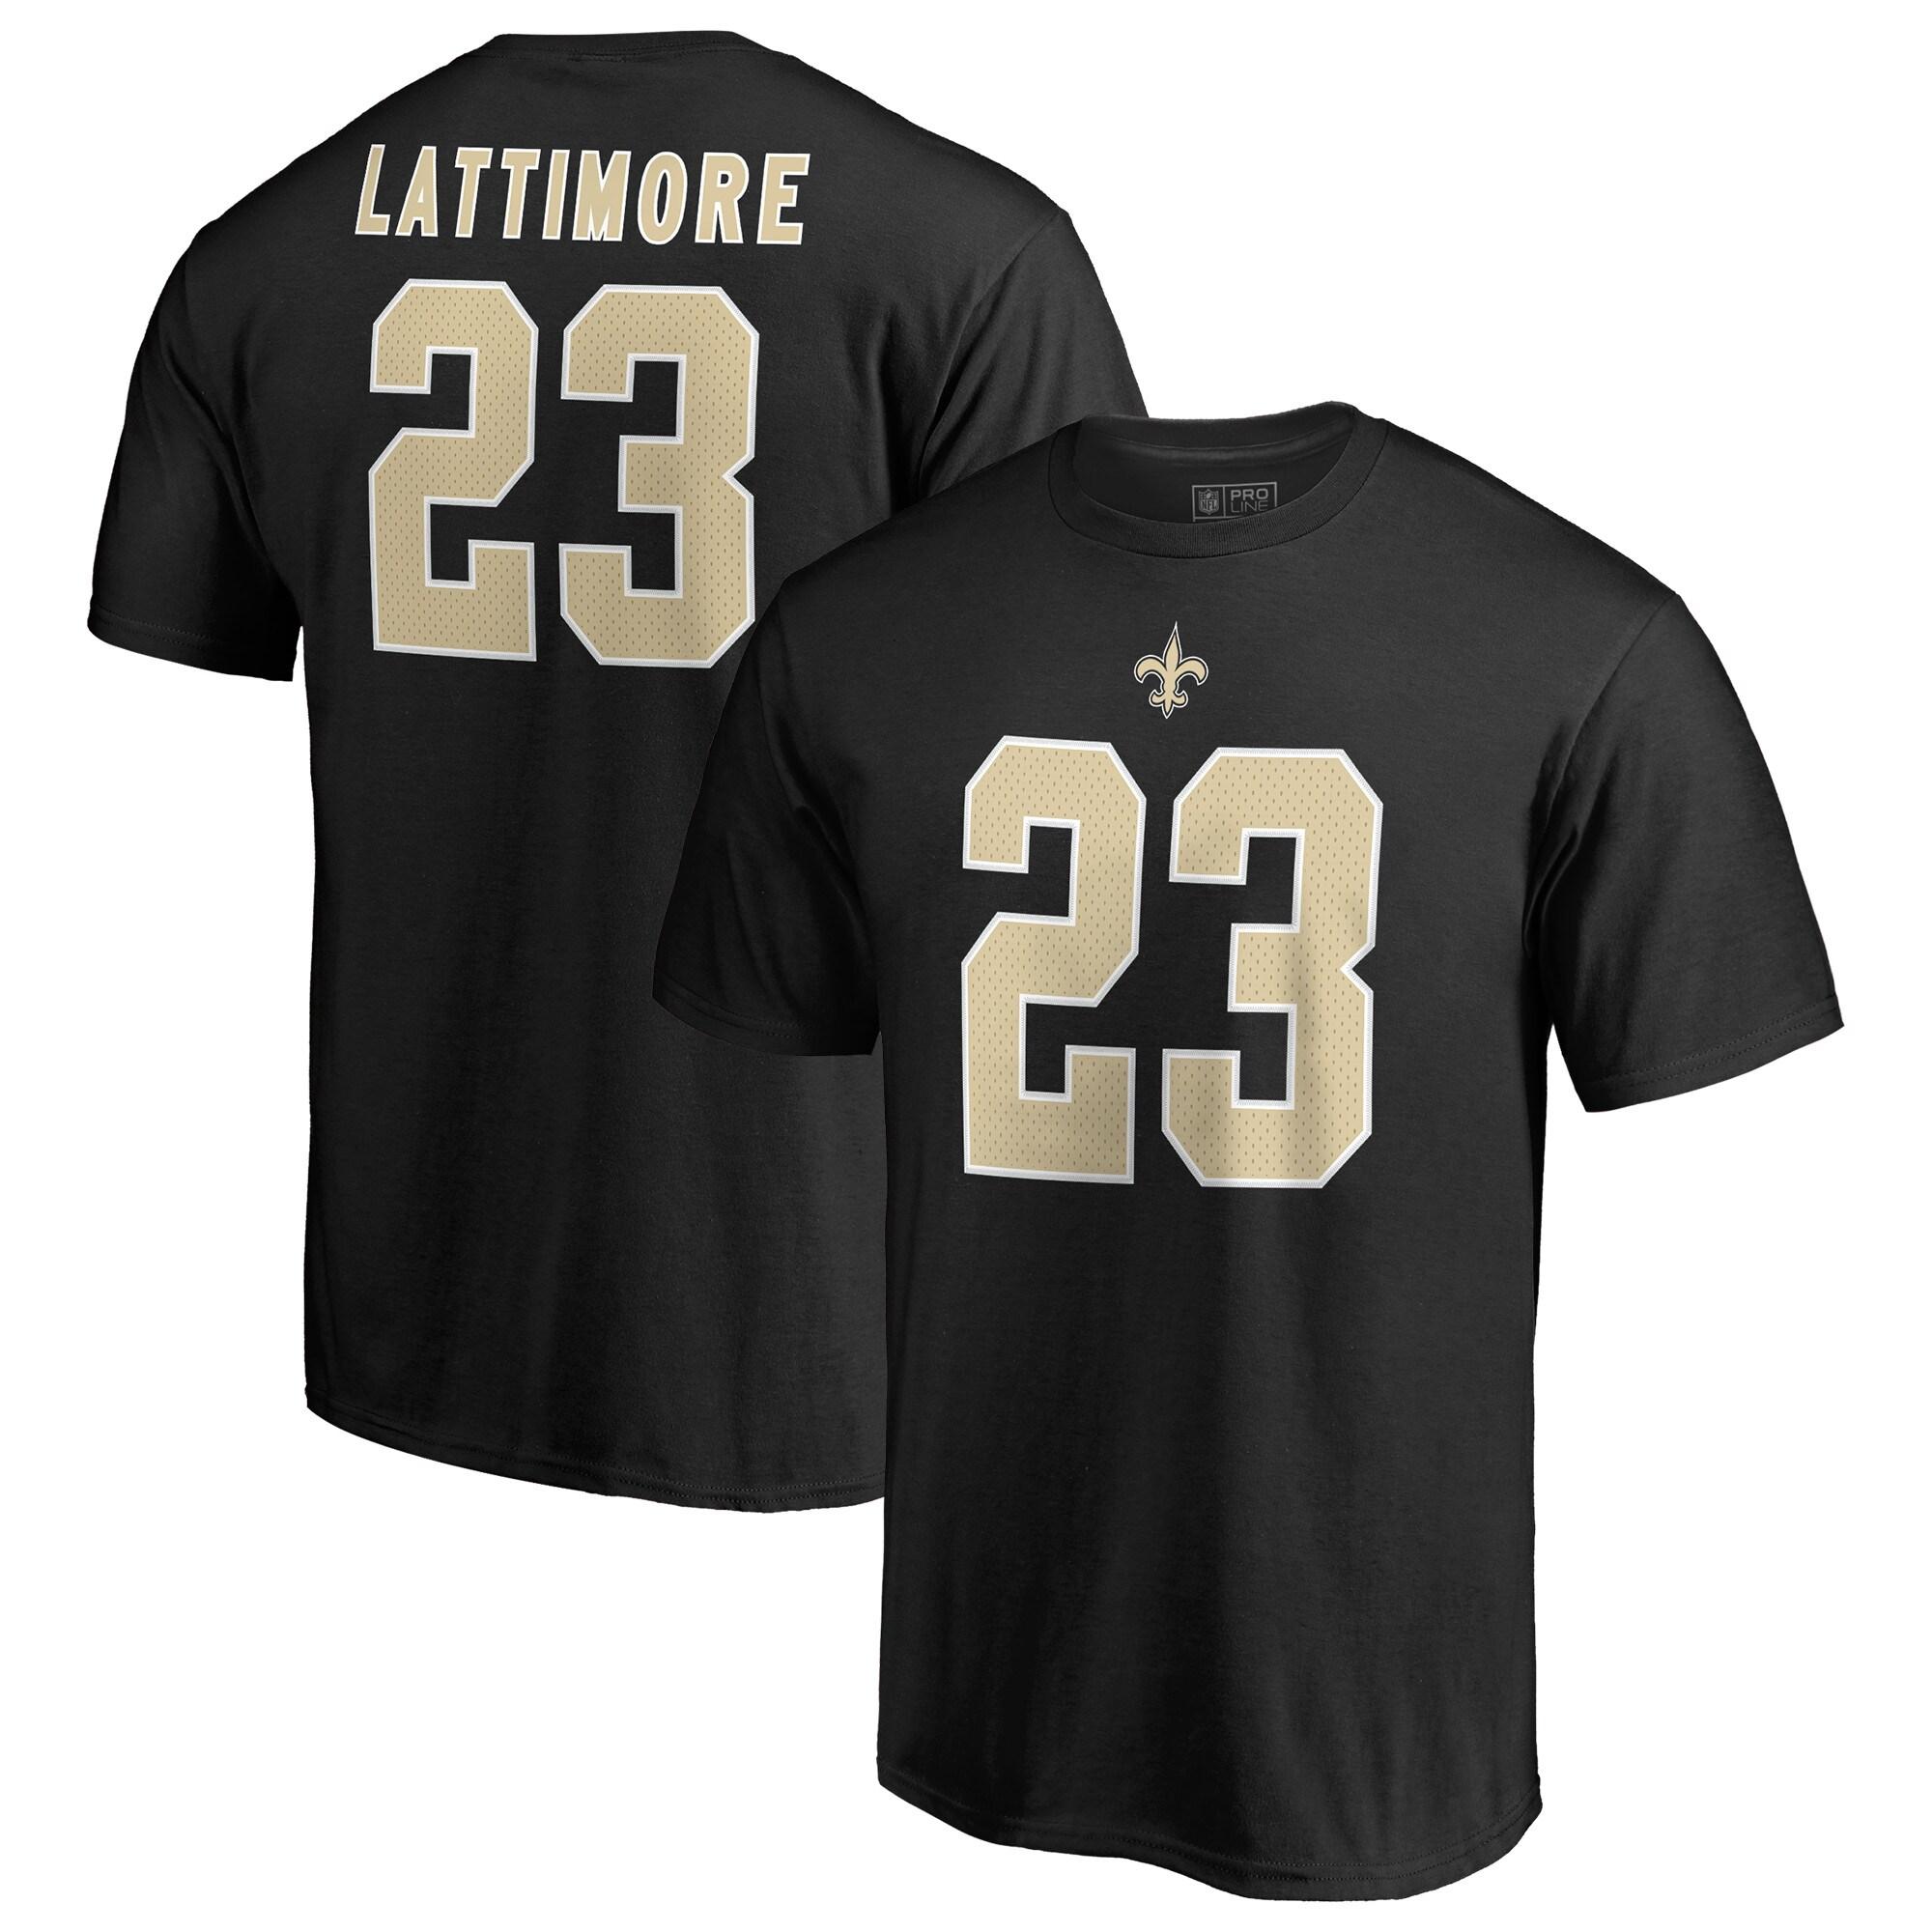 Marshon Lattimore New Orleans Saints NFL Pro Line by Fanatics Branded Authentic Stack Name & Number T-Shirt - Black